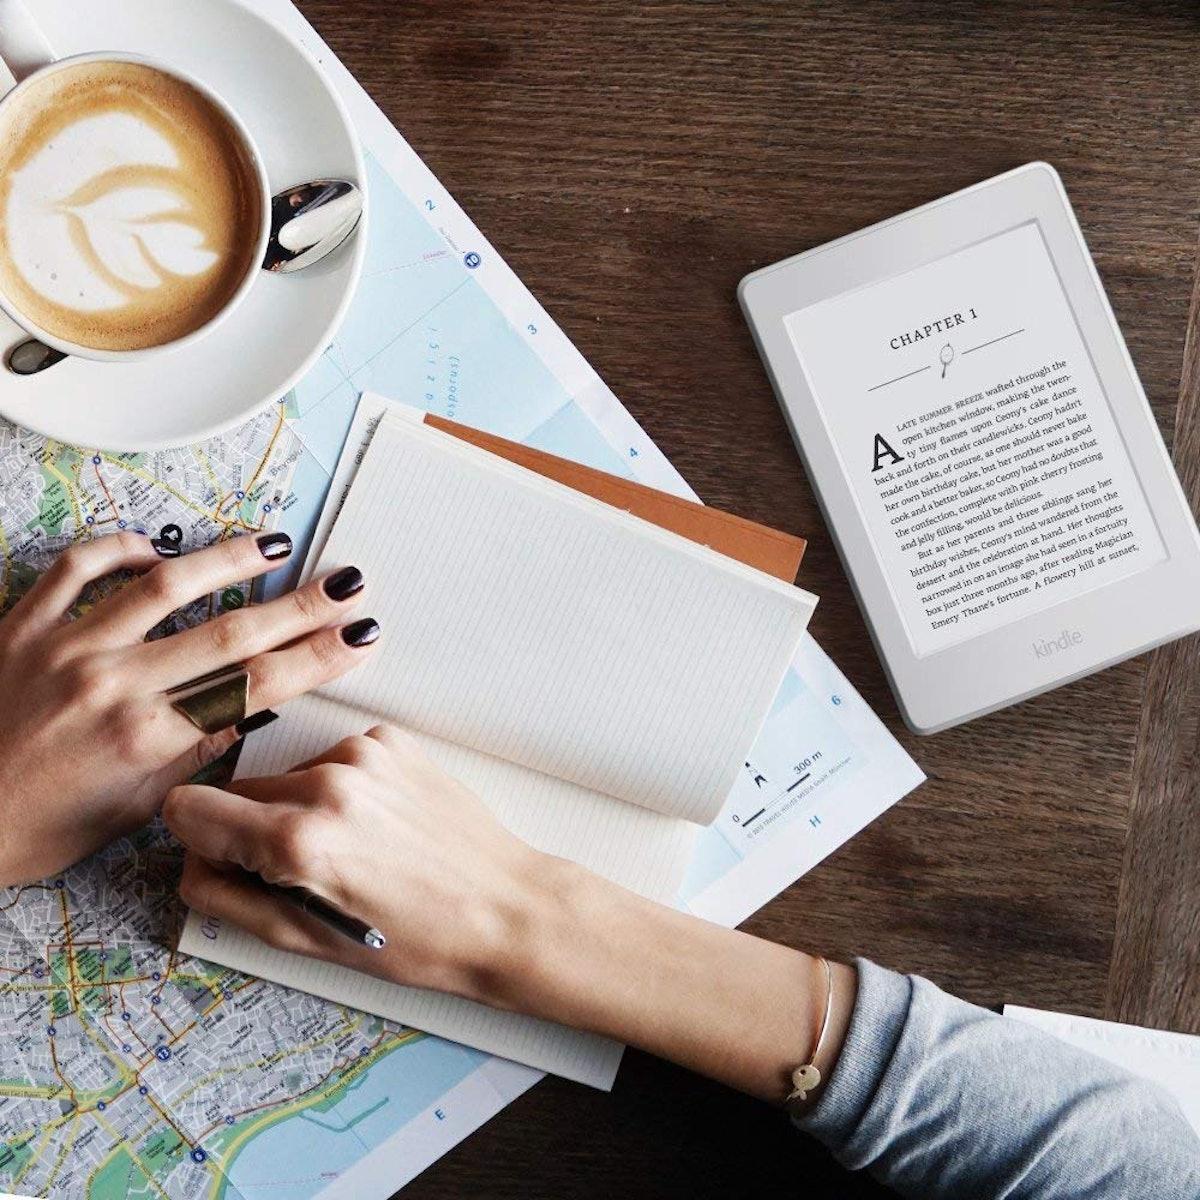 Amazon Kindle Paperwhite E-Reader